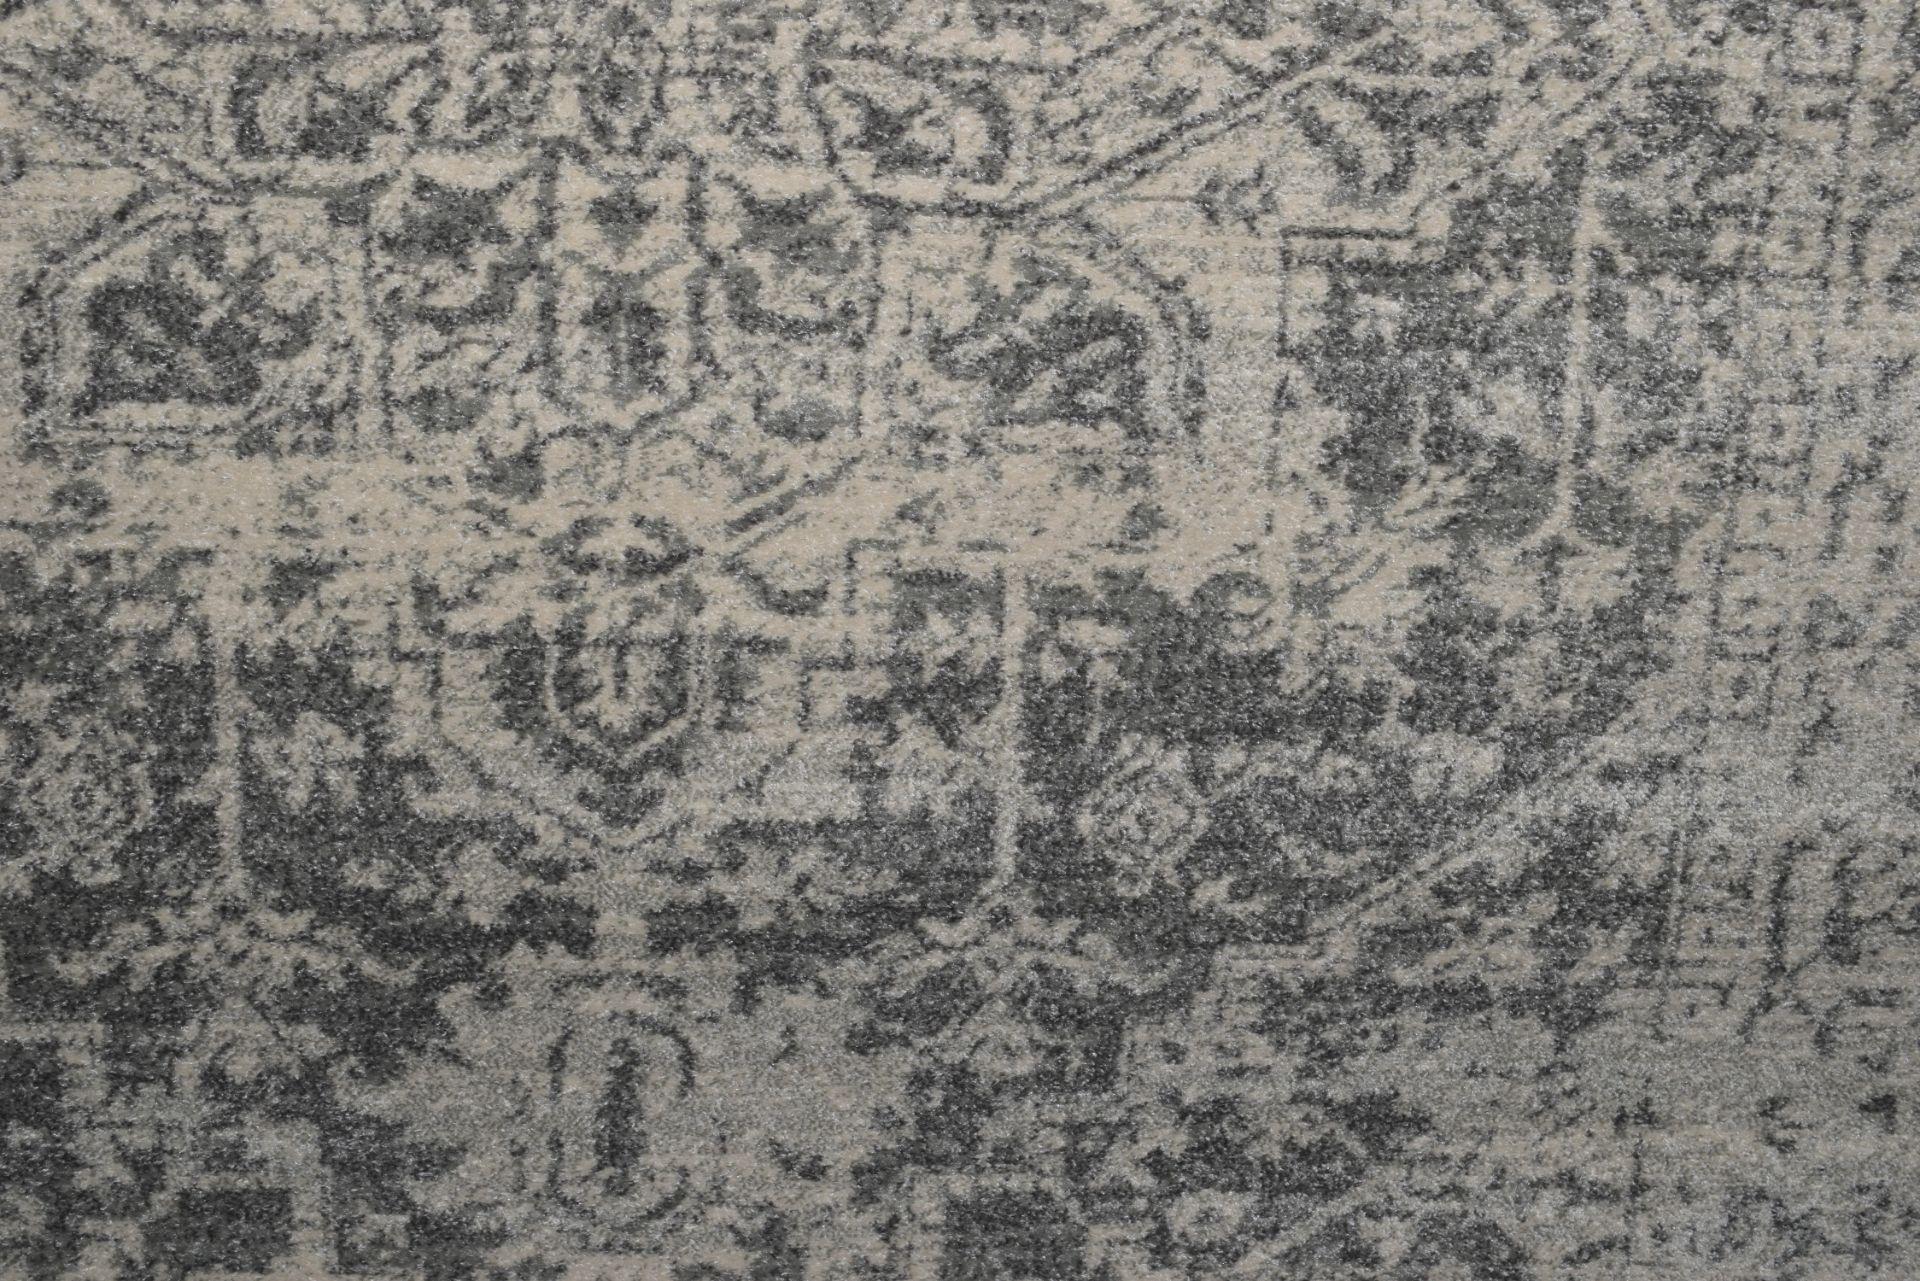 Surya Harpert rug, 160 x 220cm - Image 2 of 2